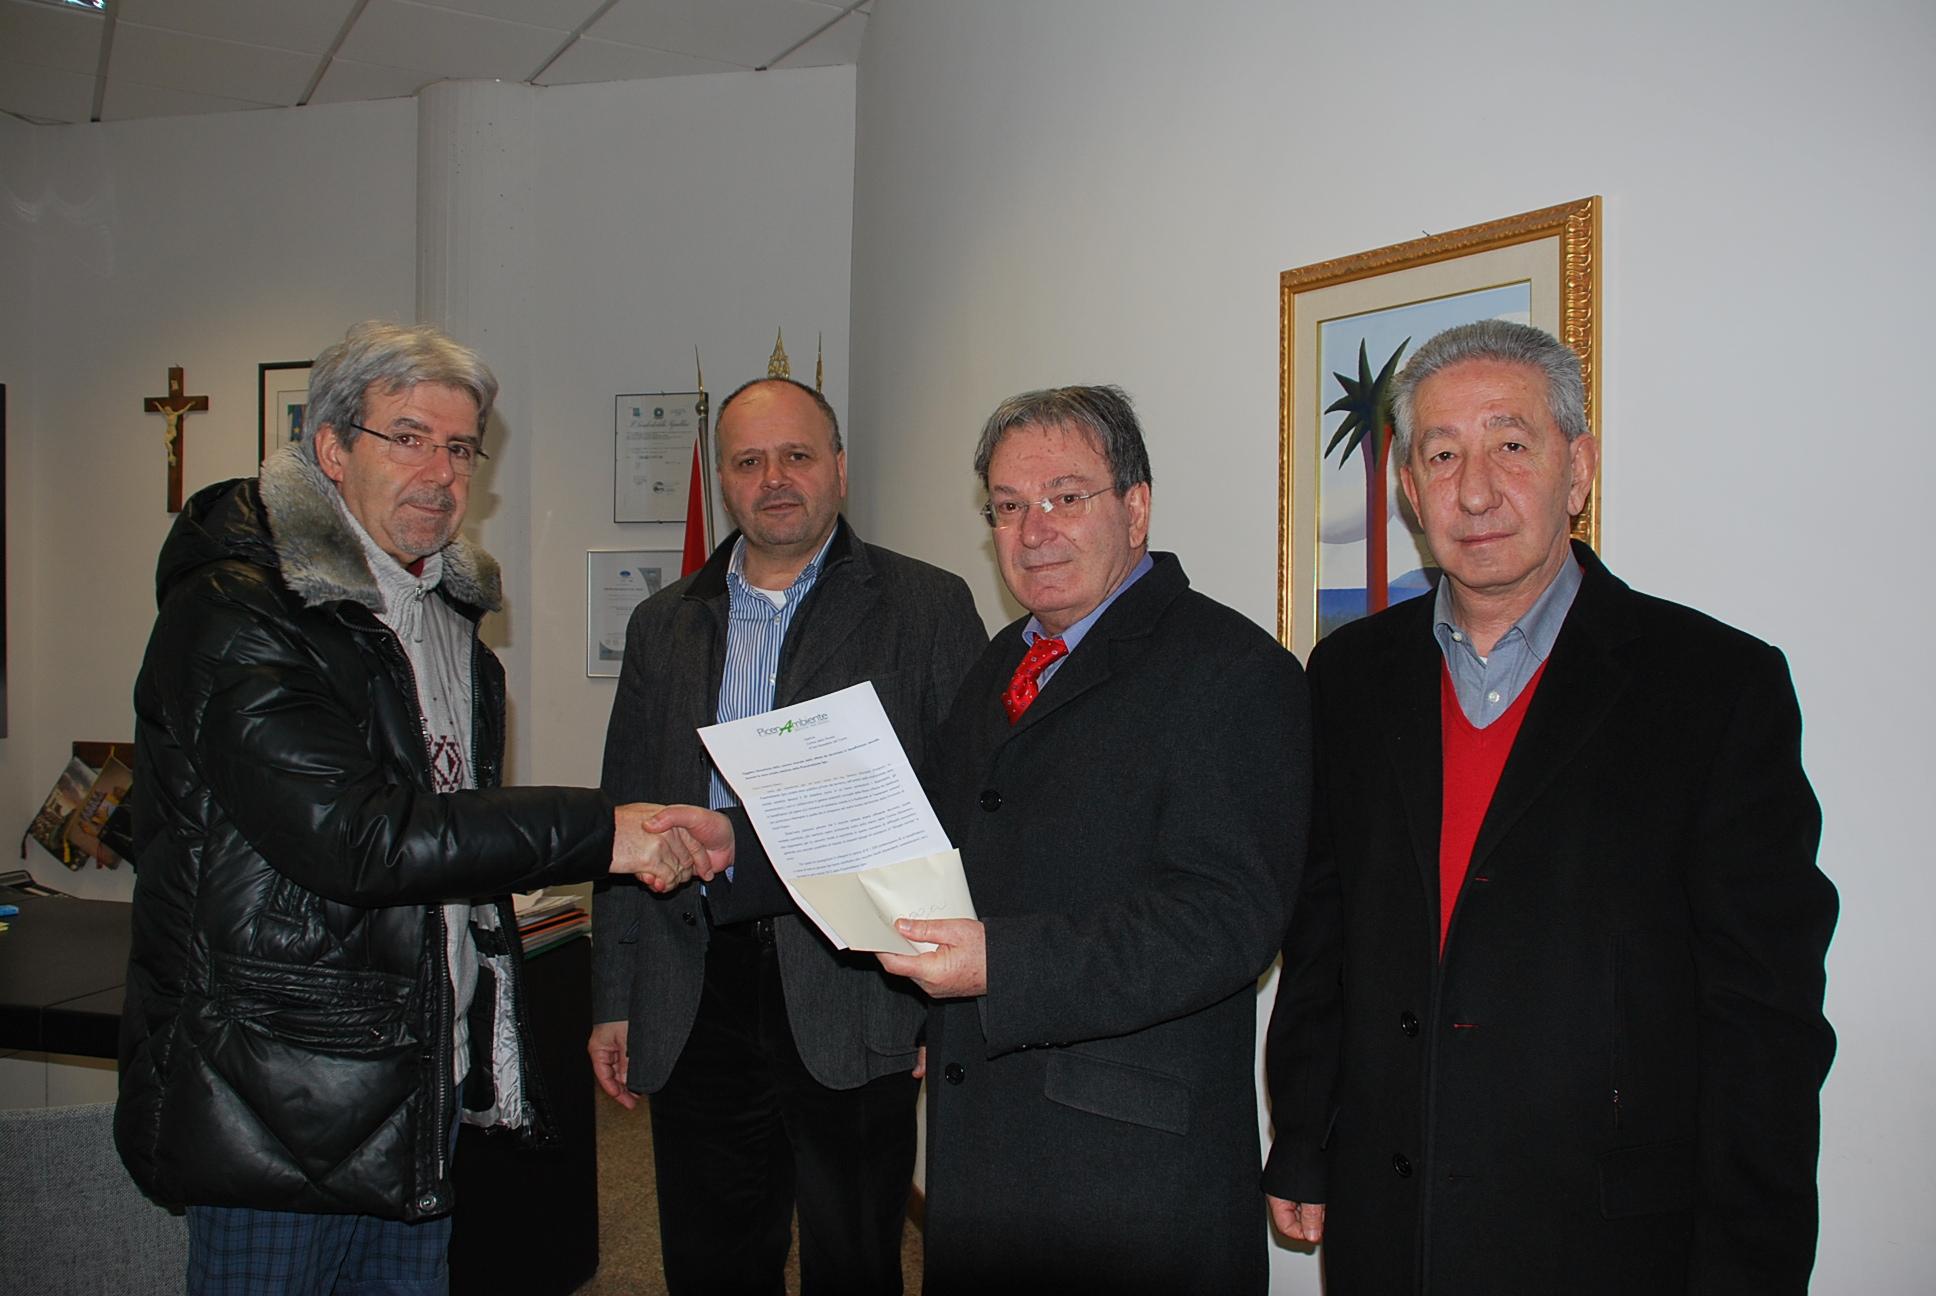 Picenambiente e Caritas insieme al sindaco Gaspari